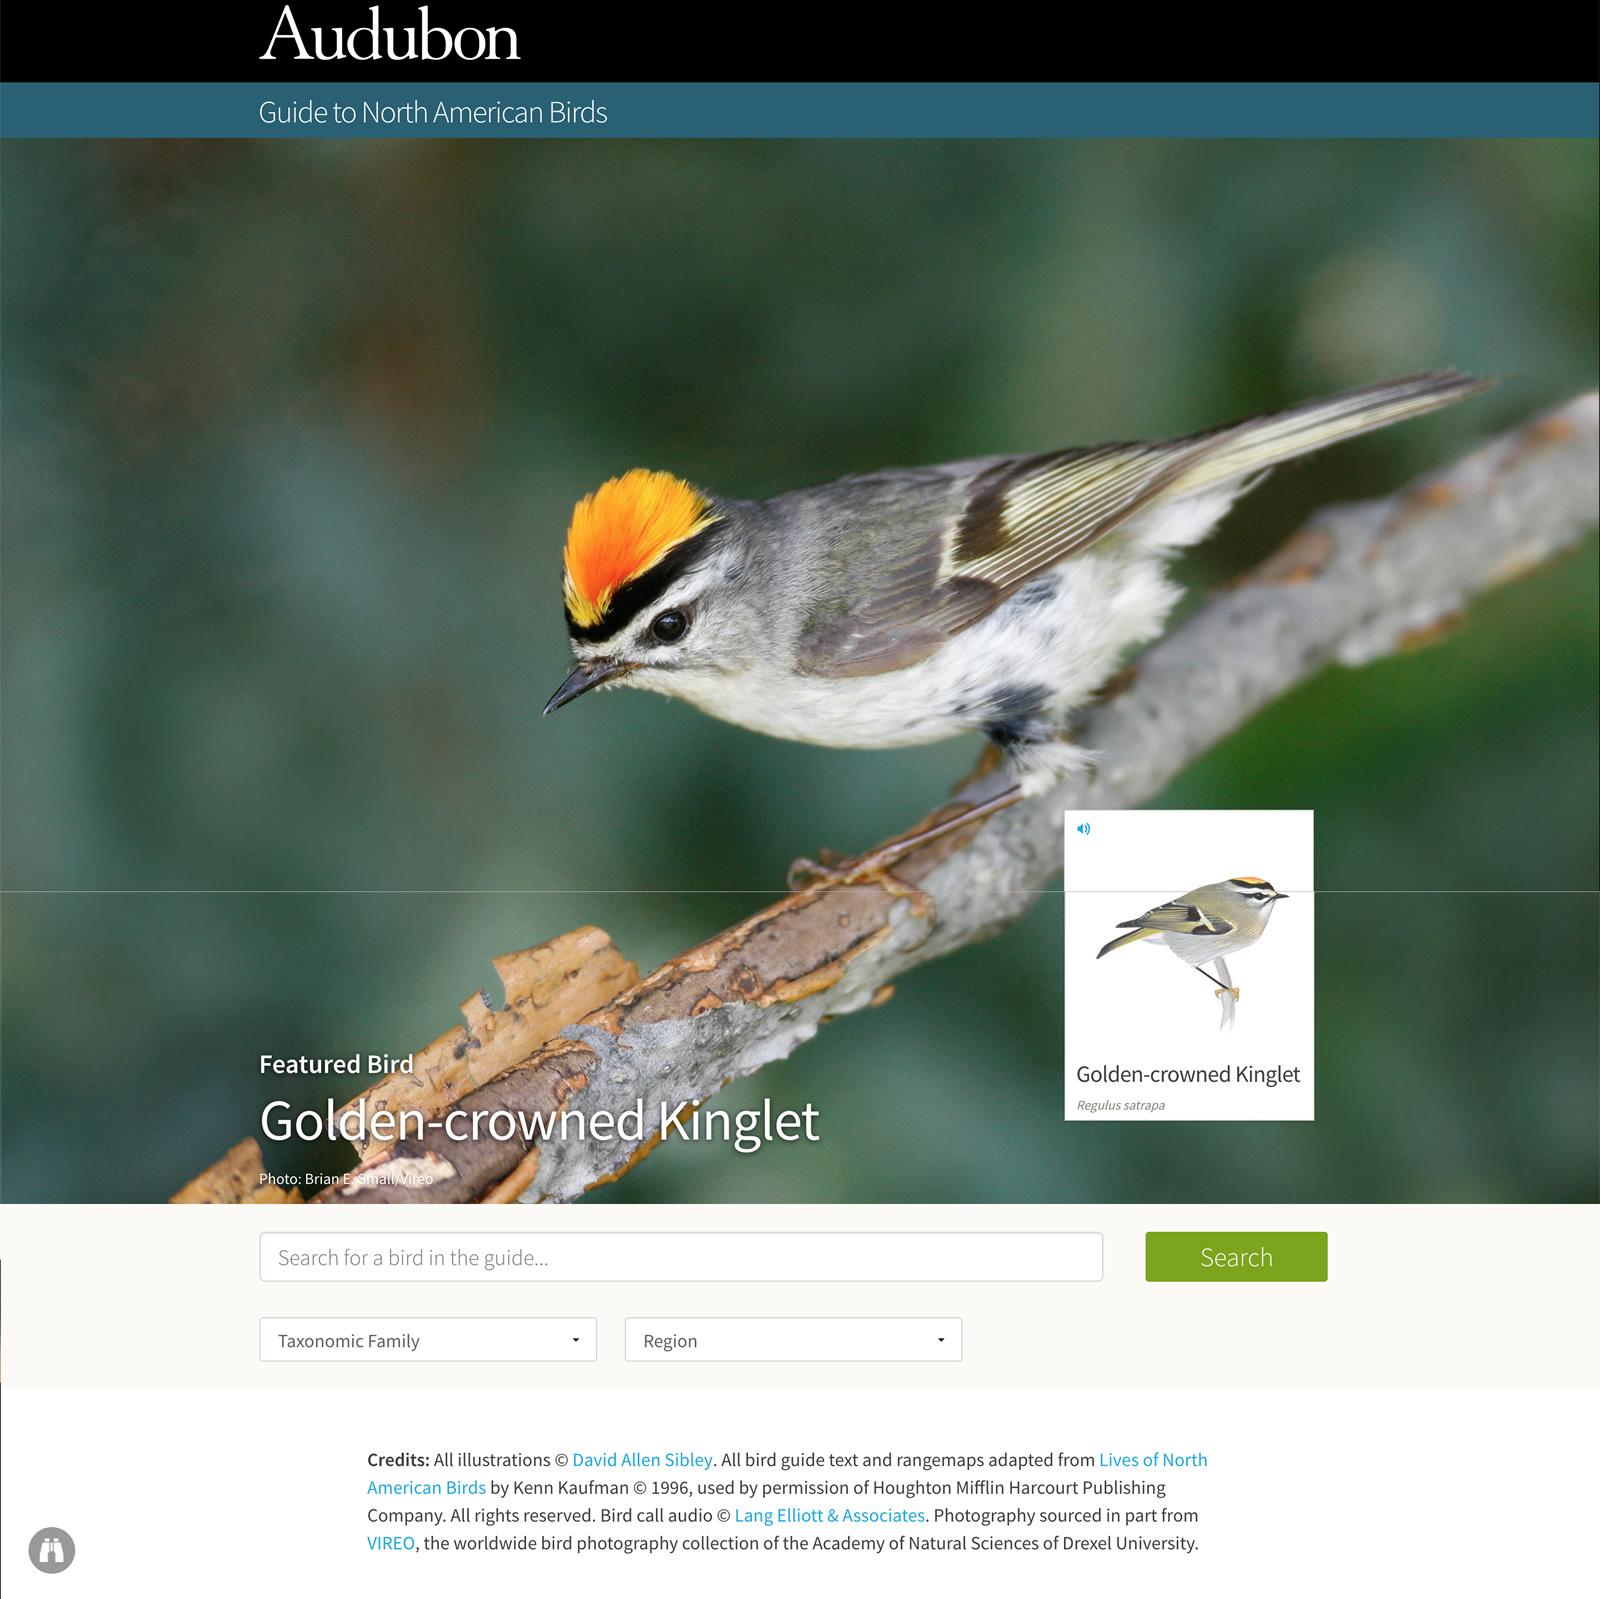 Audubonweguide.jpg